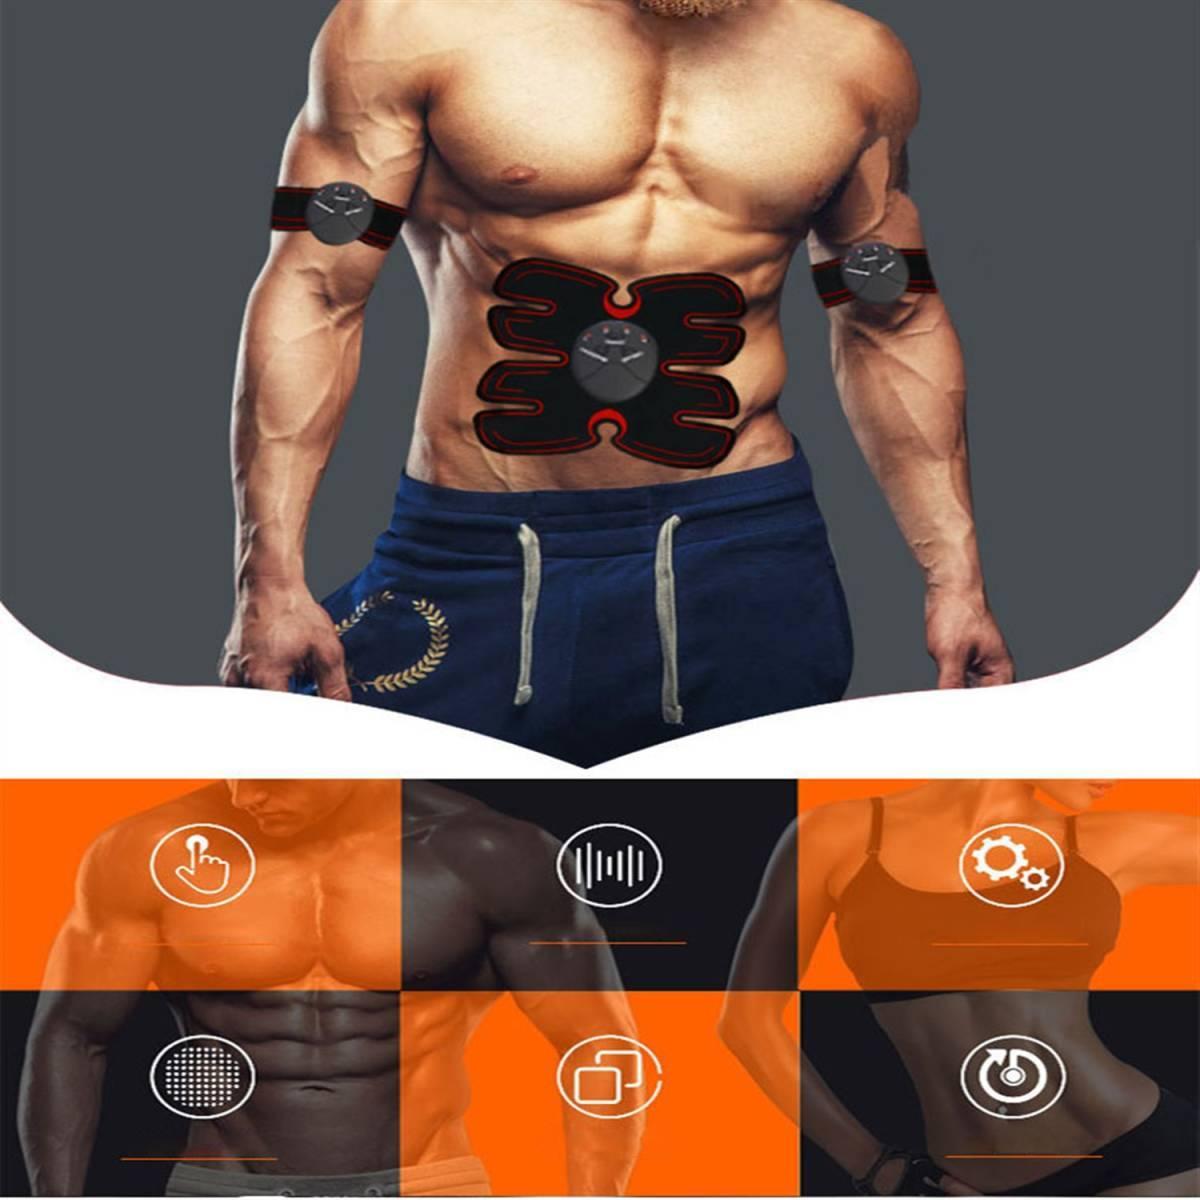 EMS 腹筋ベルト 腹筋マシーン 腹筋パッド 太もも 腕筋 筋トレ器具 ダイエット USB充電式 マッサージ エクササイズ 男女兼用_画像6